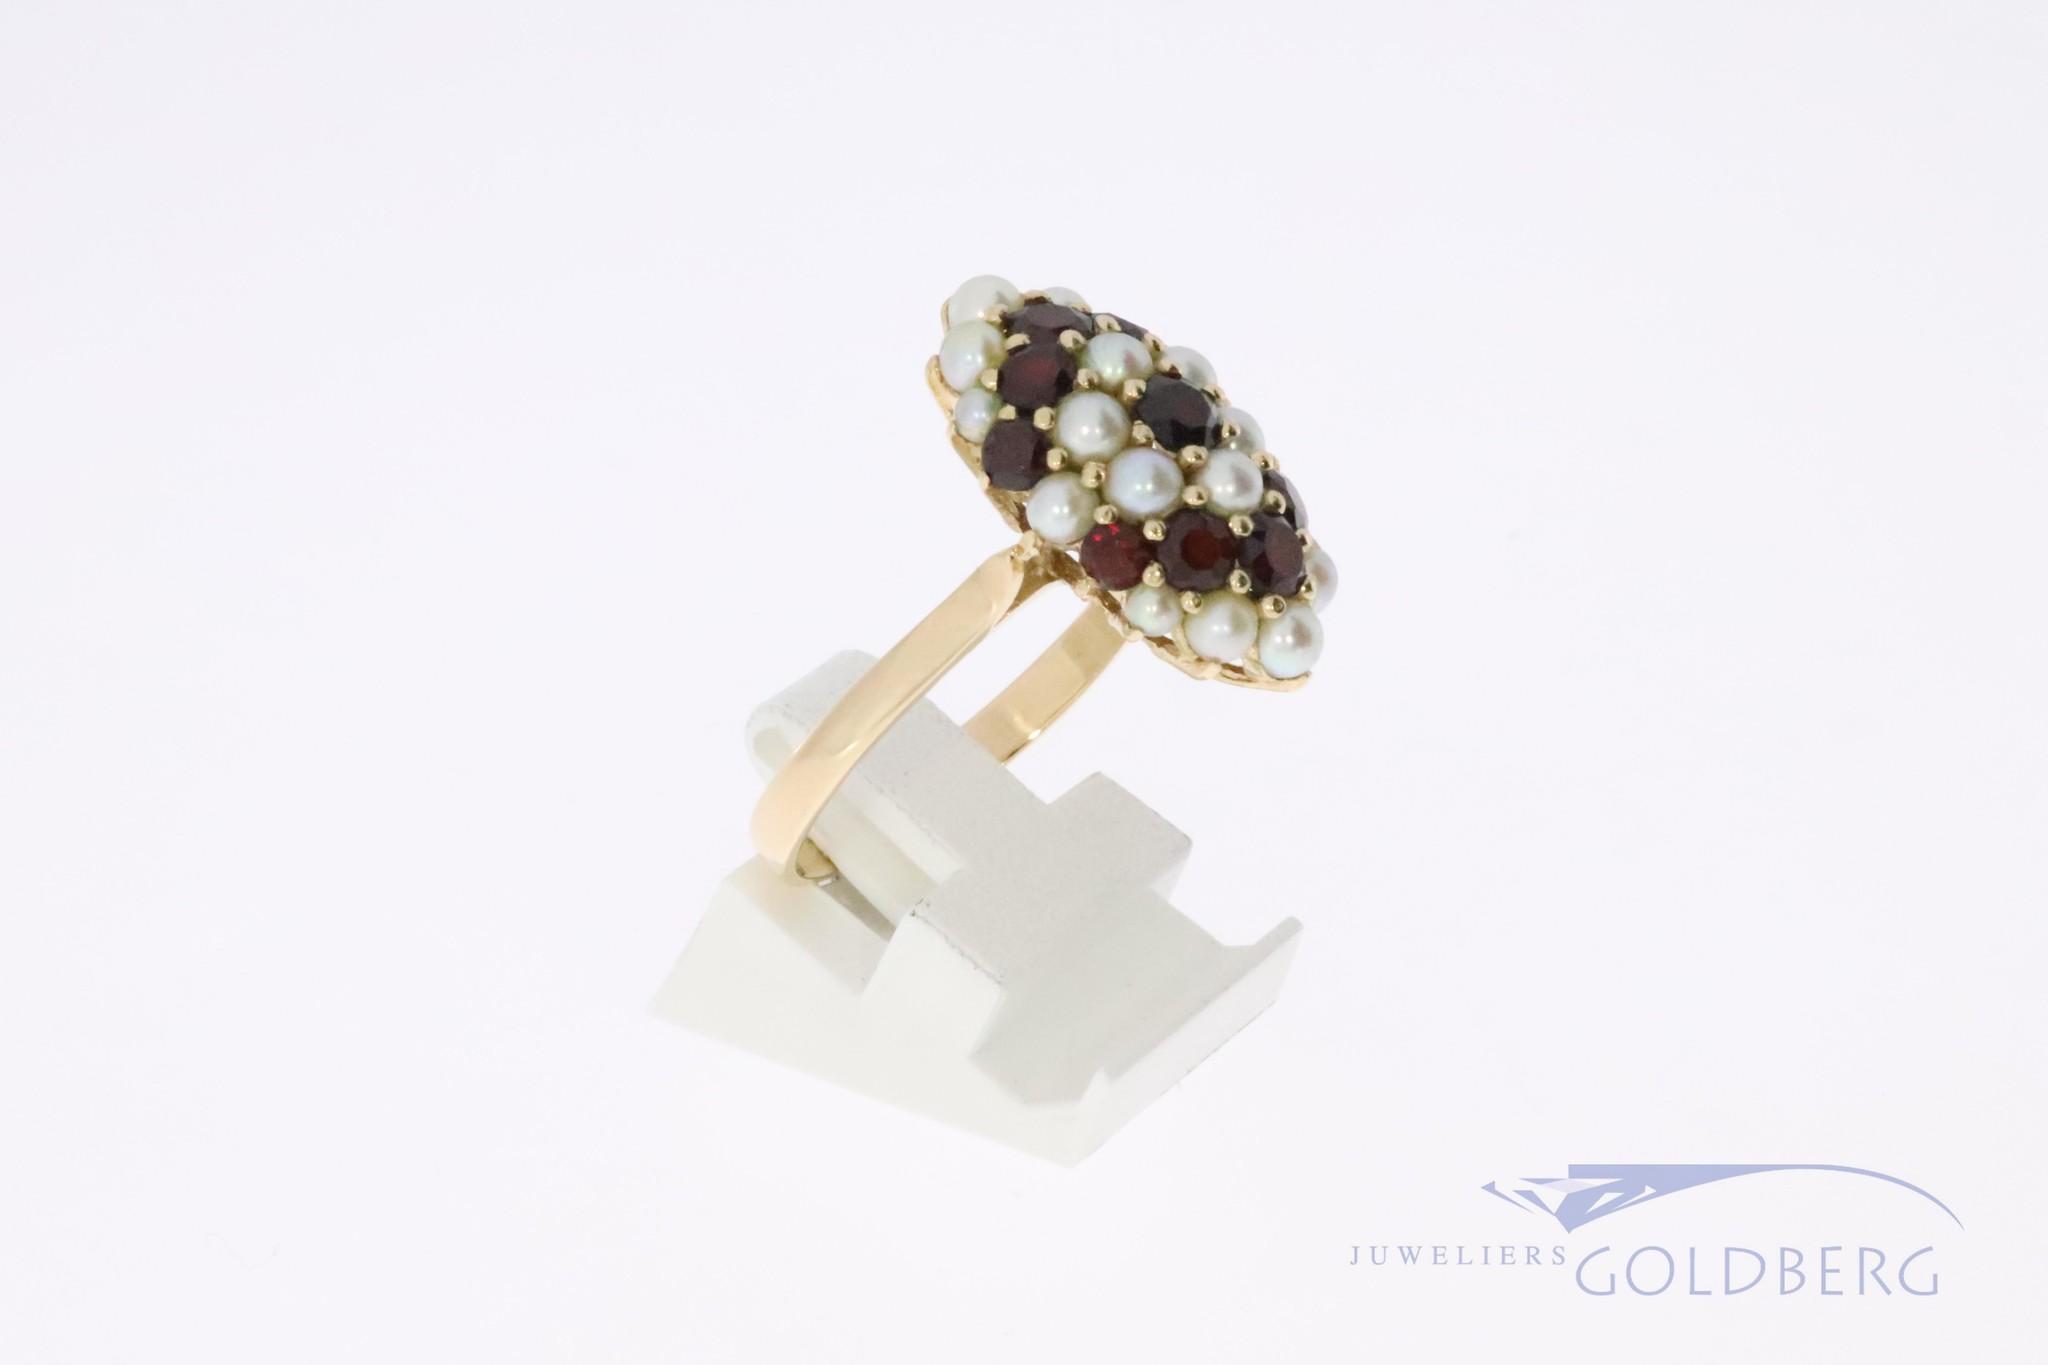 14k vintage fantasyring with garnets and pearls